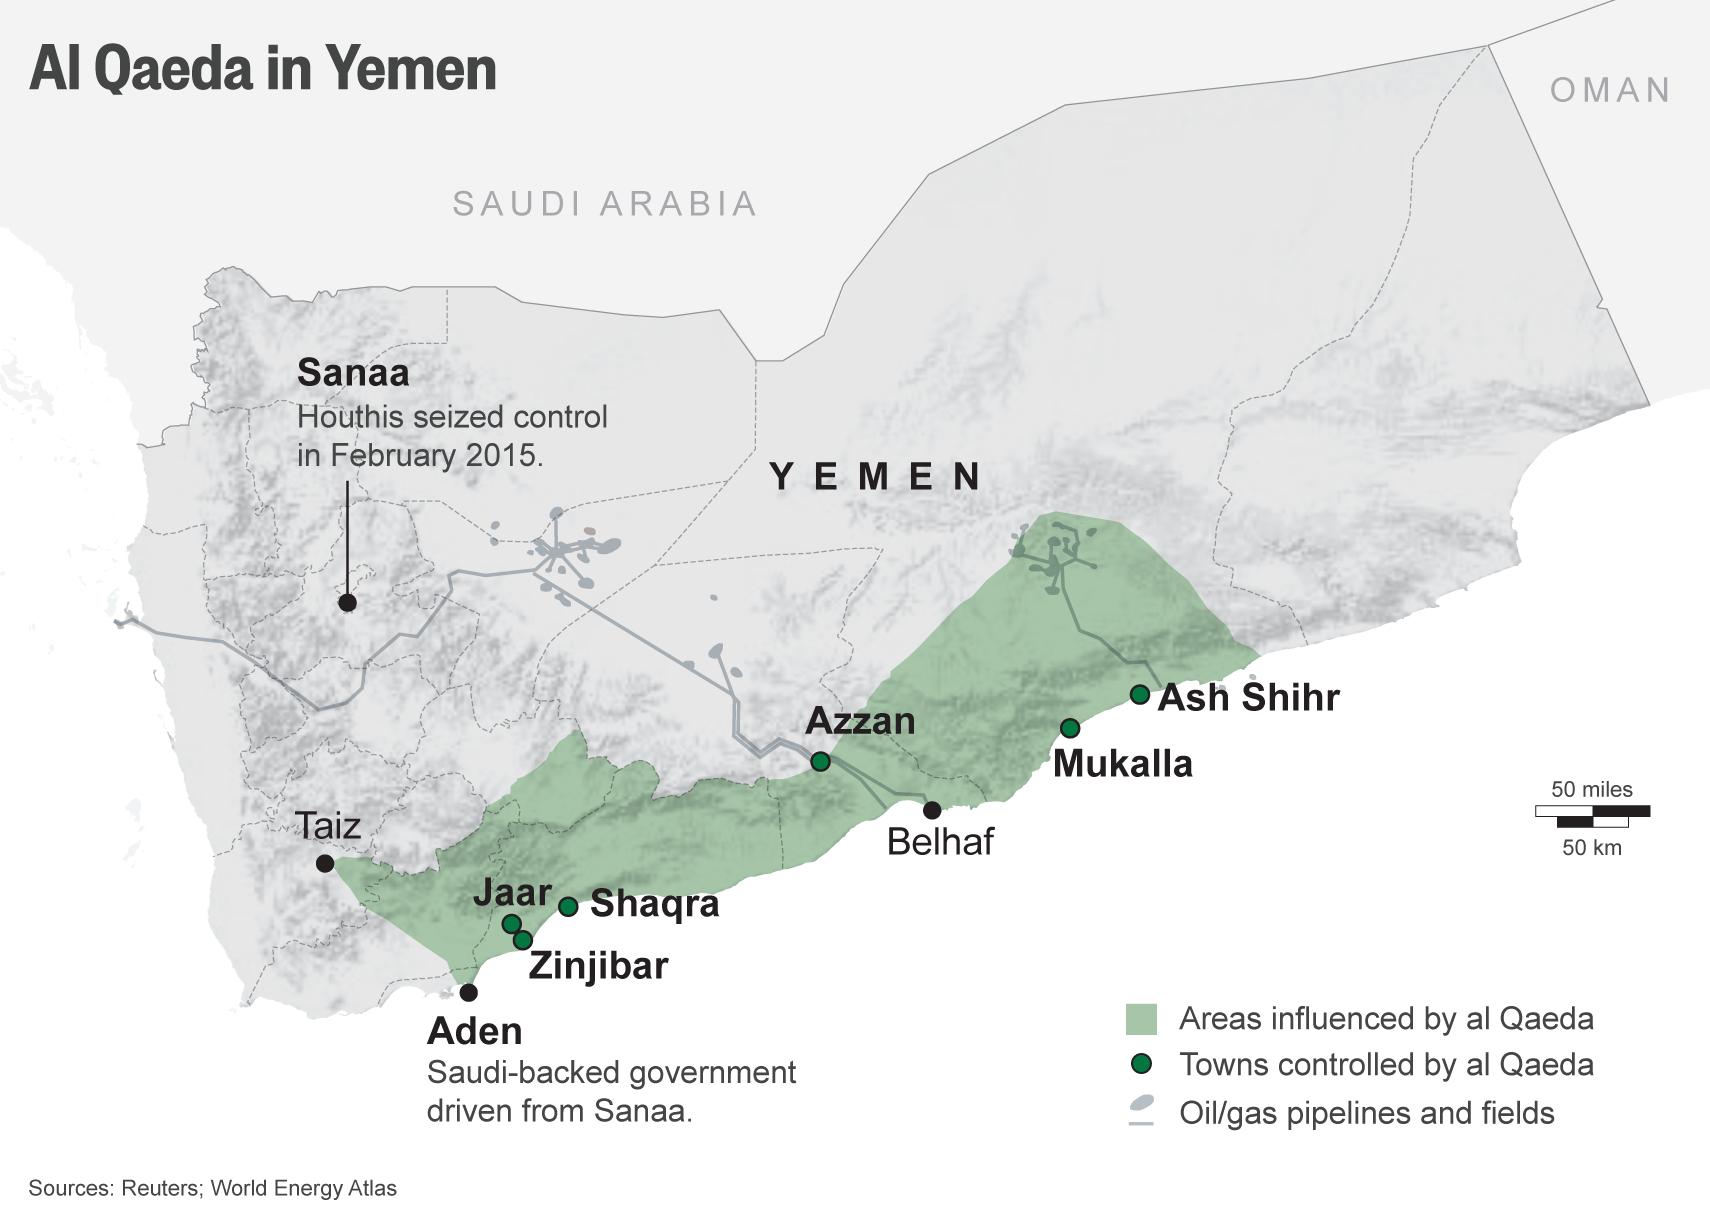 How Saudi Arabias war in Yemen has made al Qaeda stronger and richer